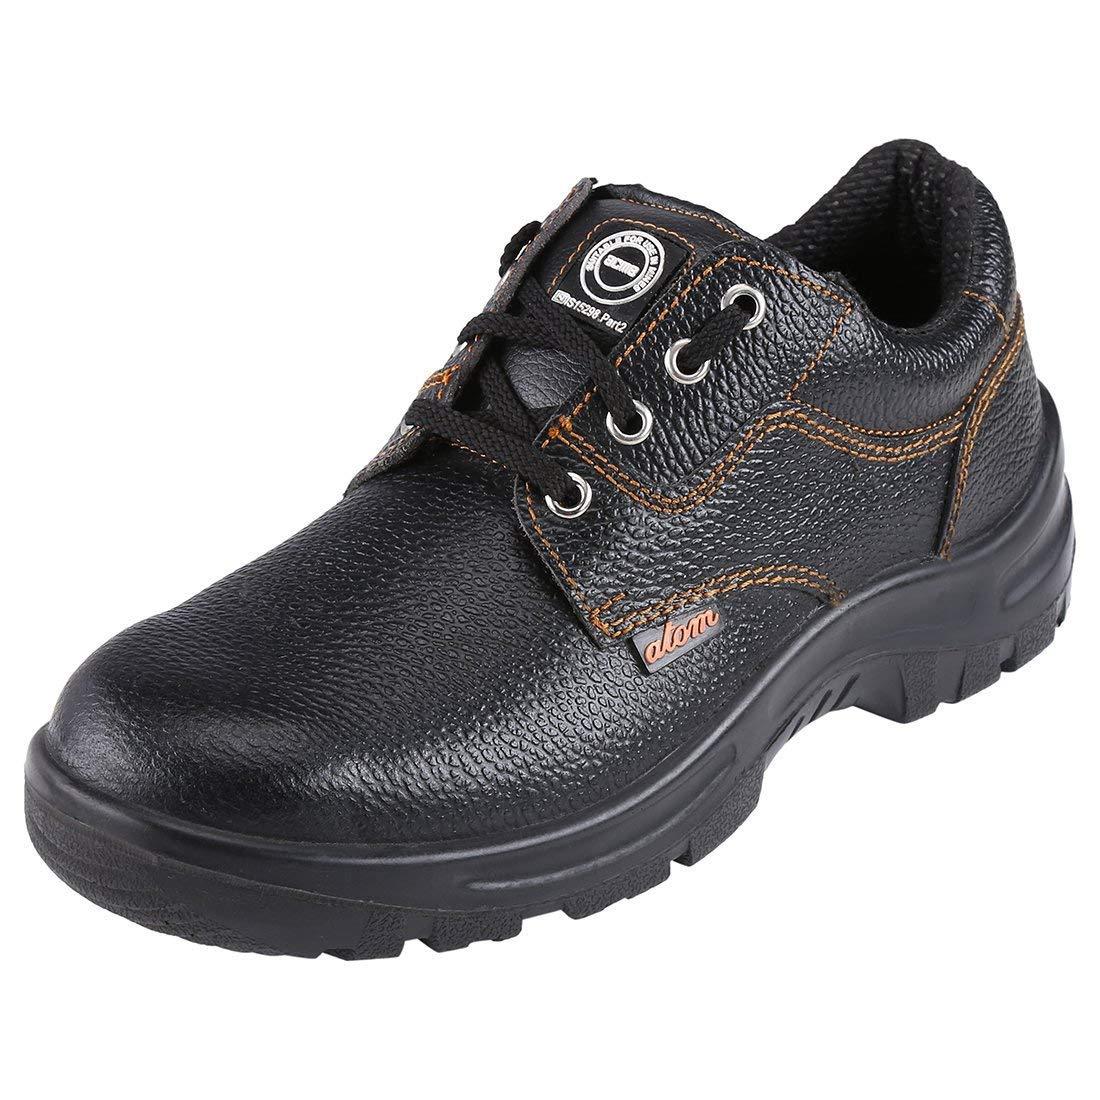 ACME Men's Atom Leather Safety Shoes Black (B07JGNKK4M) Amazon Price History, Amazon Price Tracker